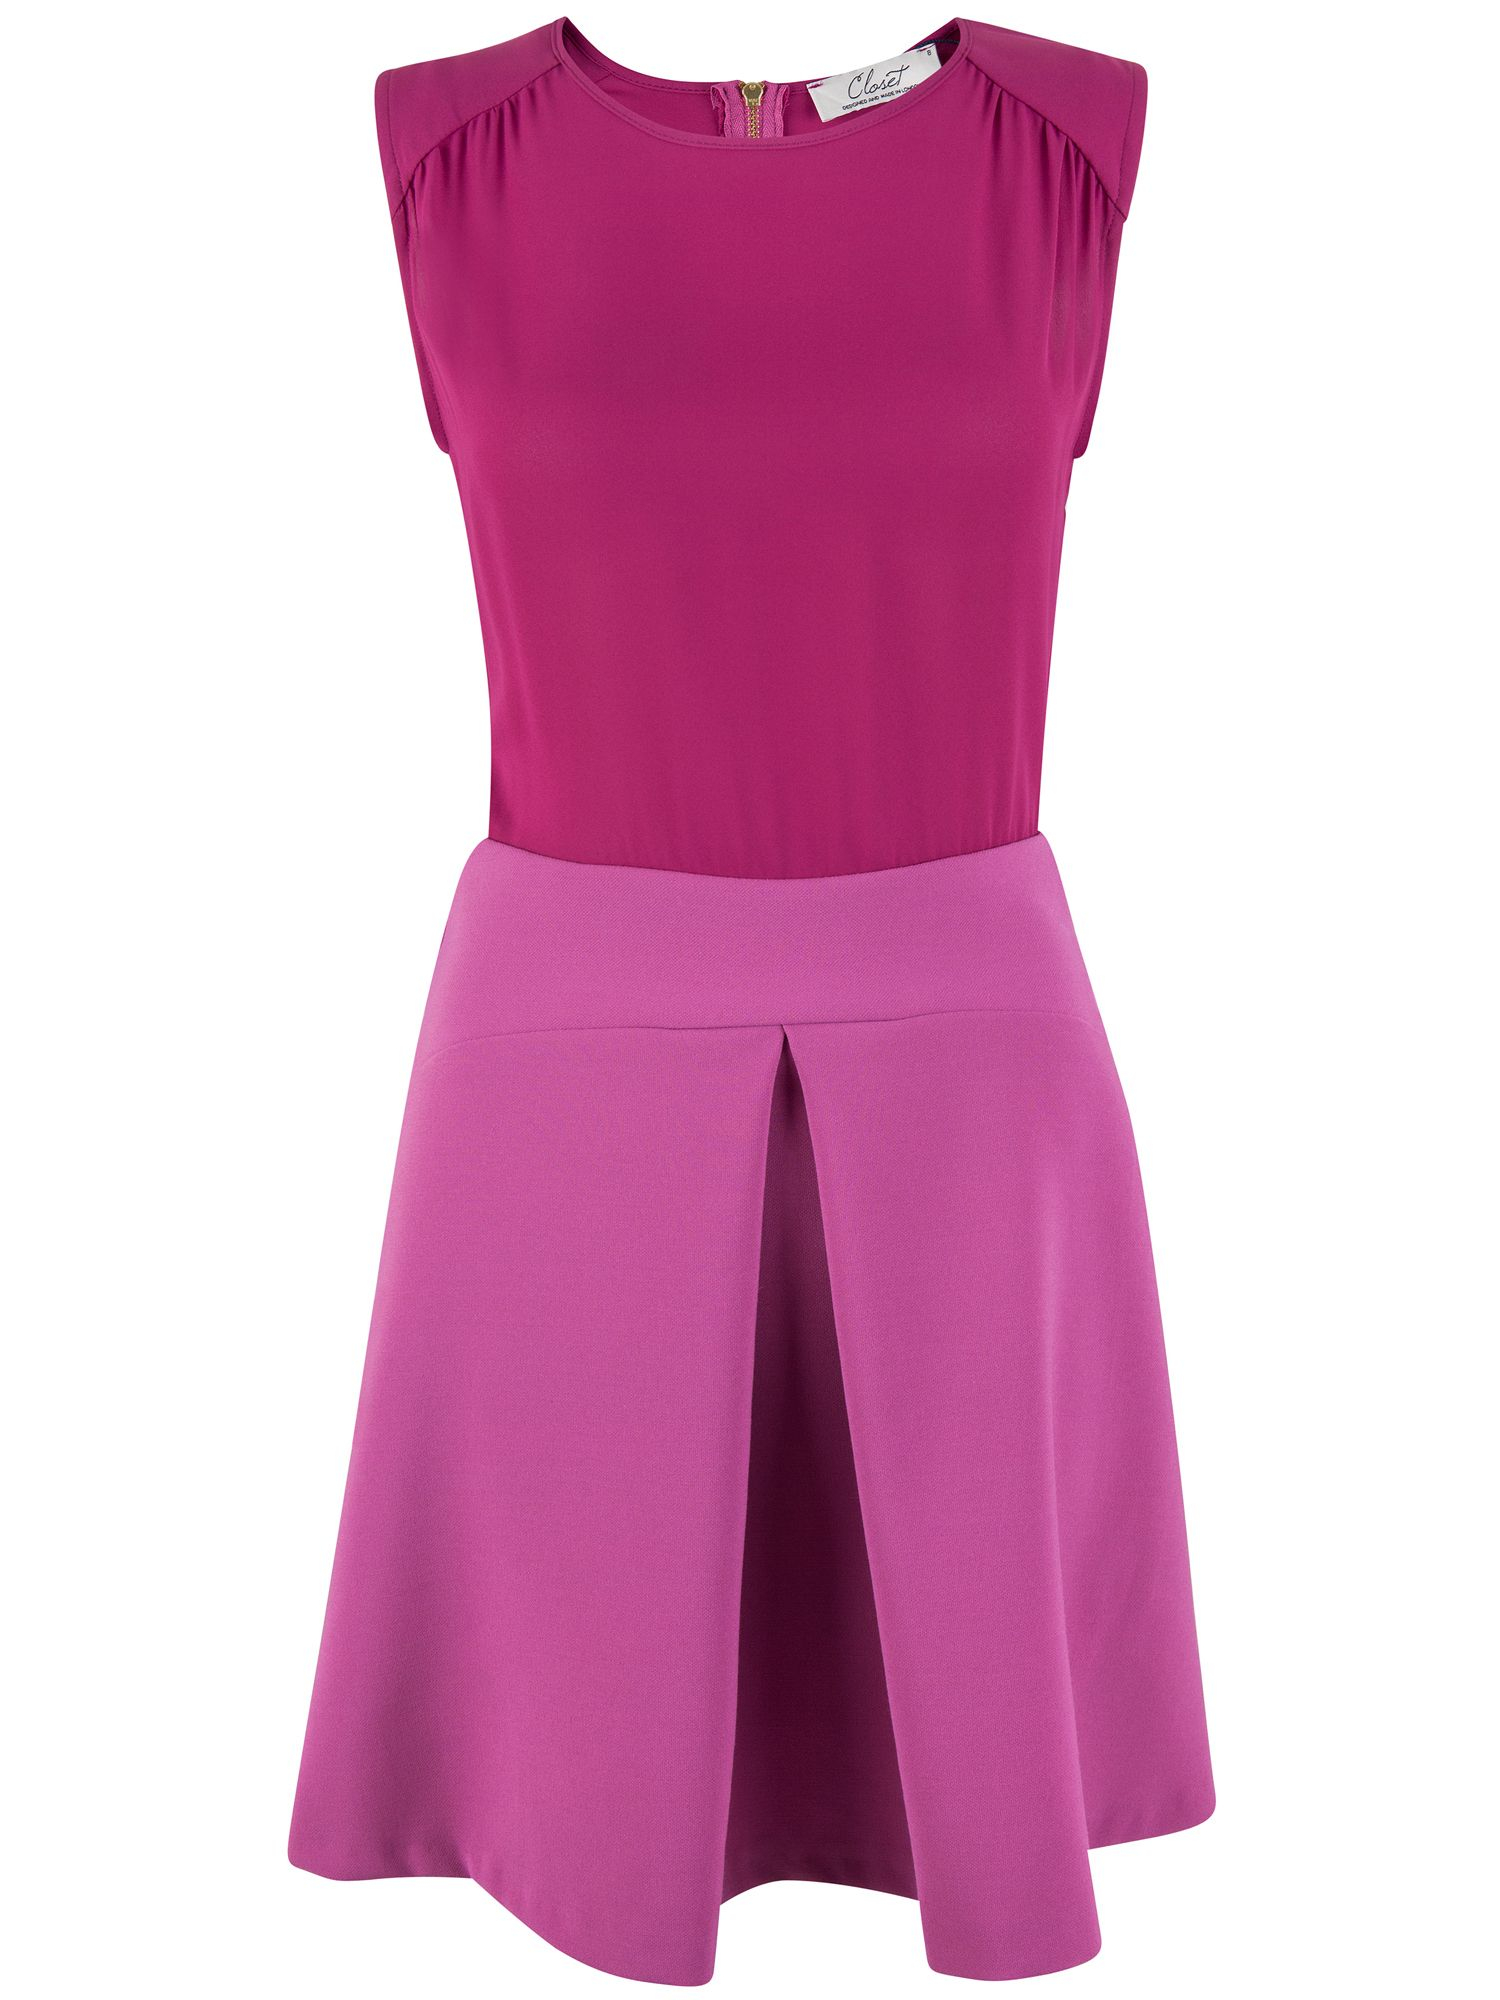 closet pleat a line skirt dress in pink lyst